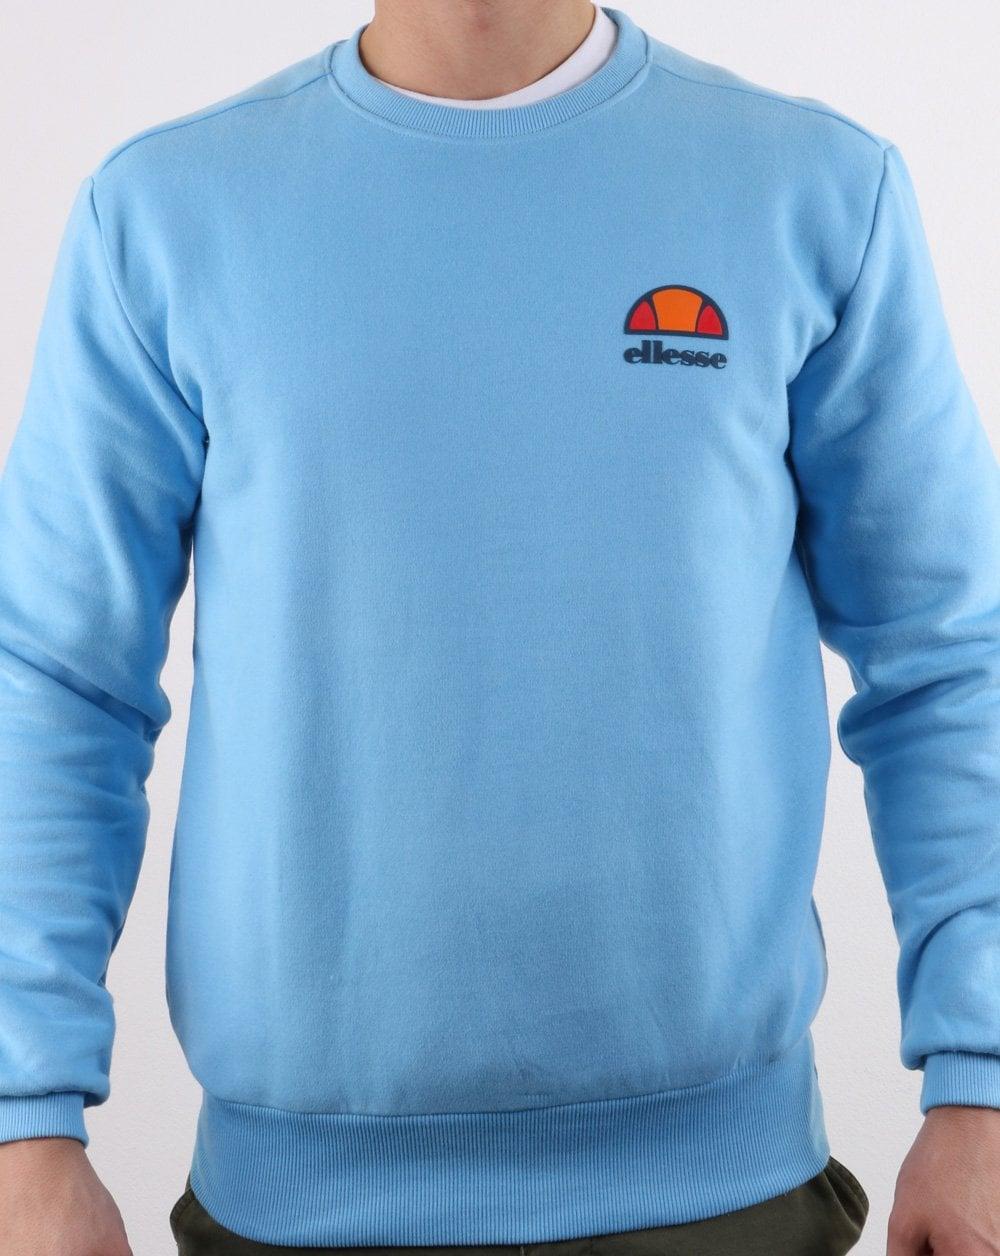 525e31723f Ellesse Sweatshirt Light Blue